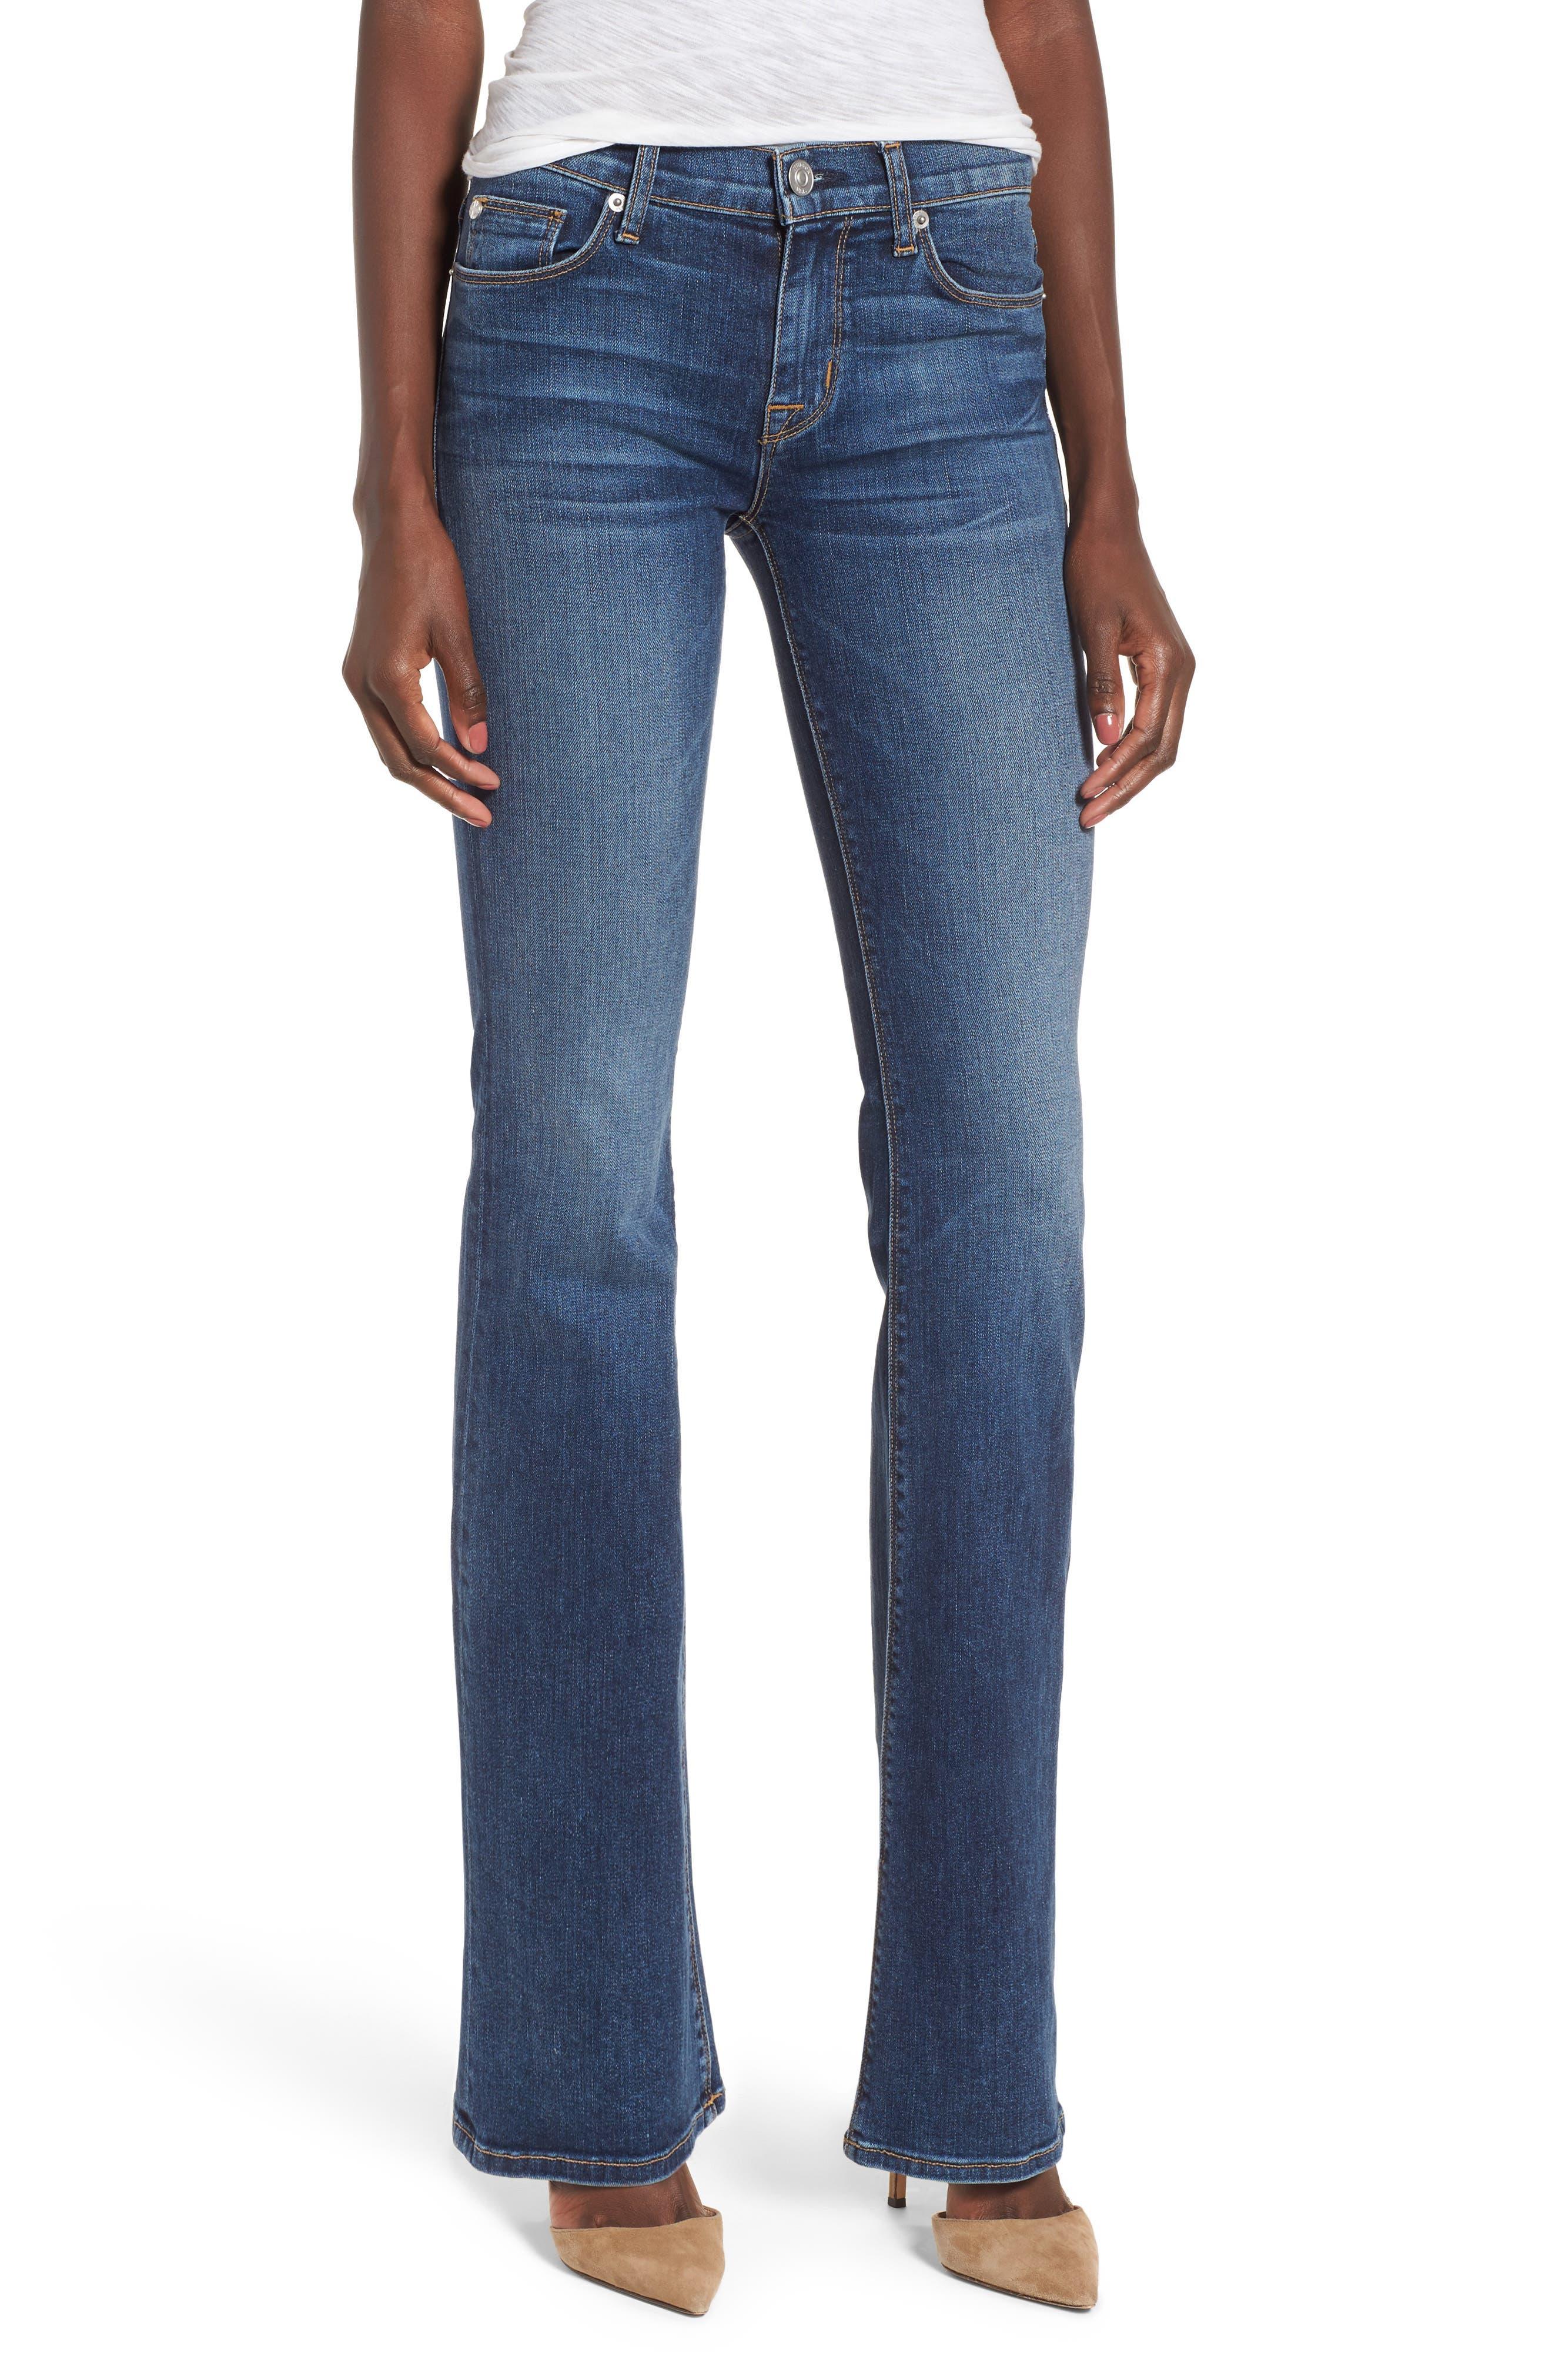 Main Image - Hudson Jeans Drew Bootcut Jeans (Unfamed)